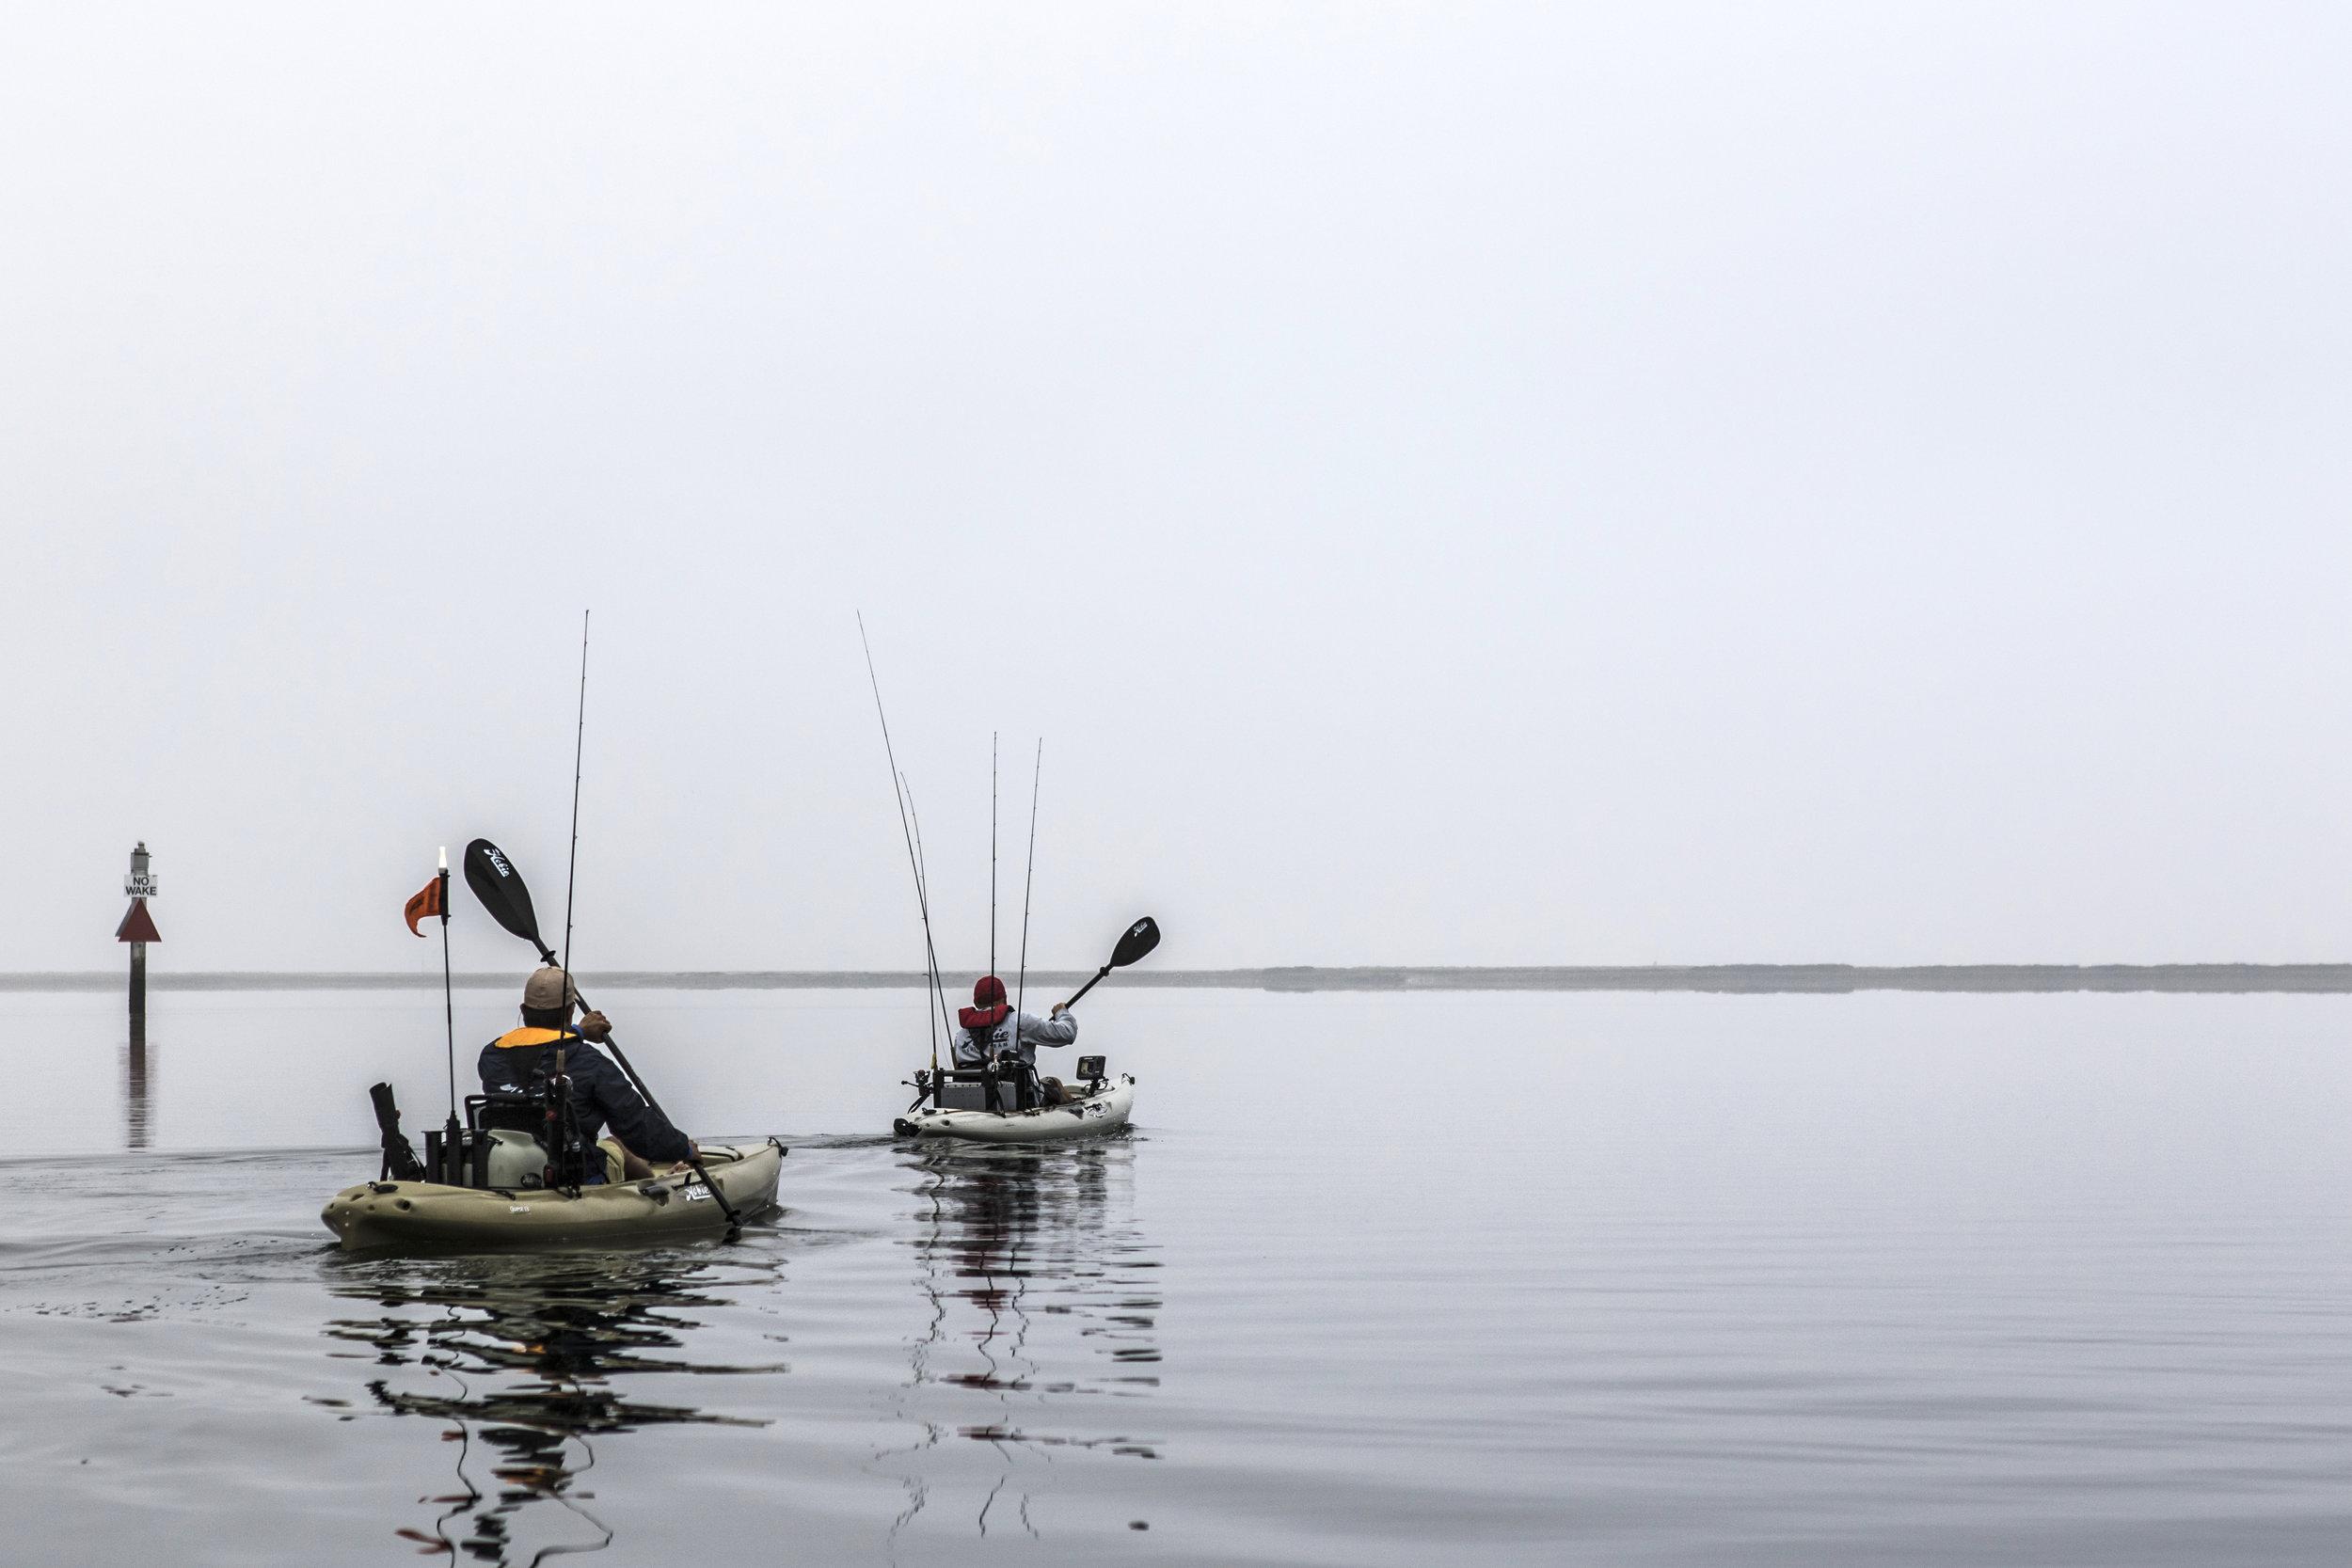 Quest13_fishing_foggy_Shane_Howie_paddling_8923_full.jpg